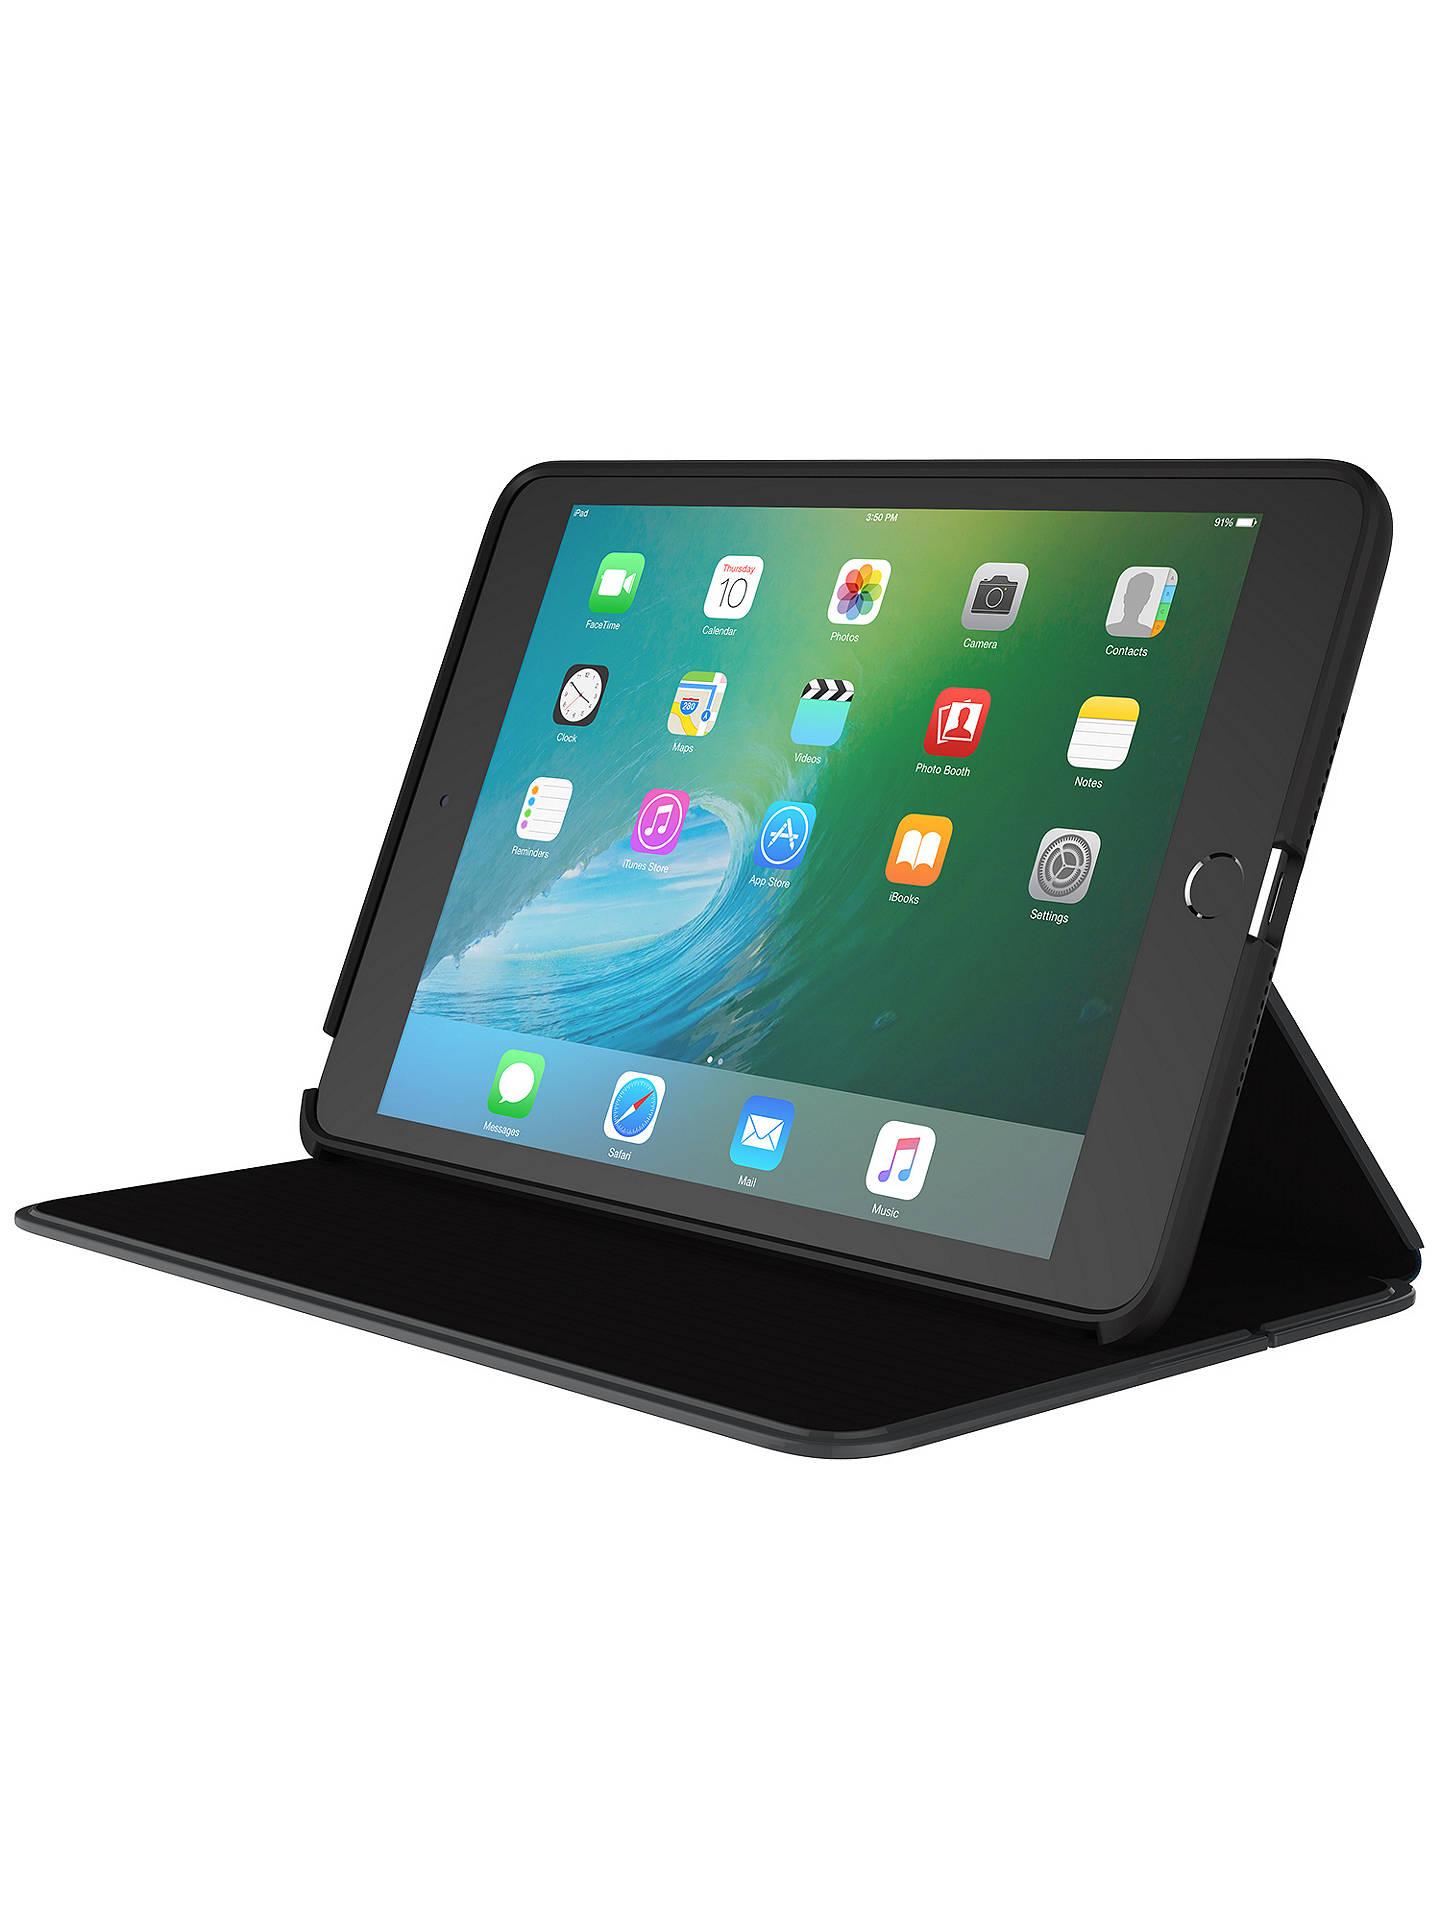 buy online 34e3d 68e26 Speck Durafolio iPad Mini 4 Case, Black/Slate Grey at John Lewis ...